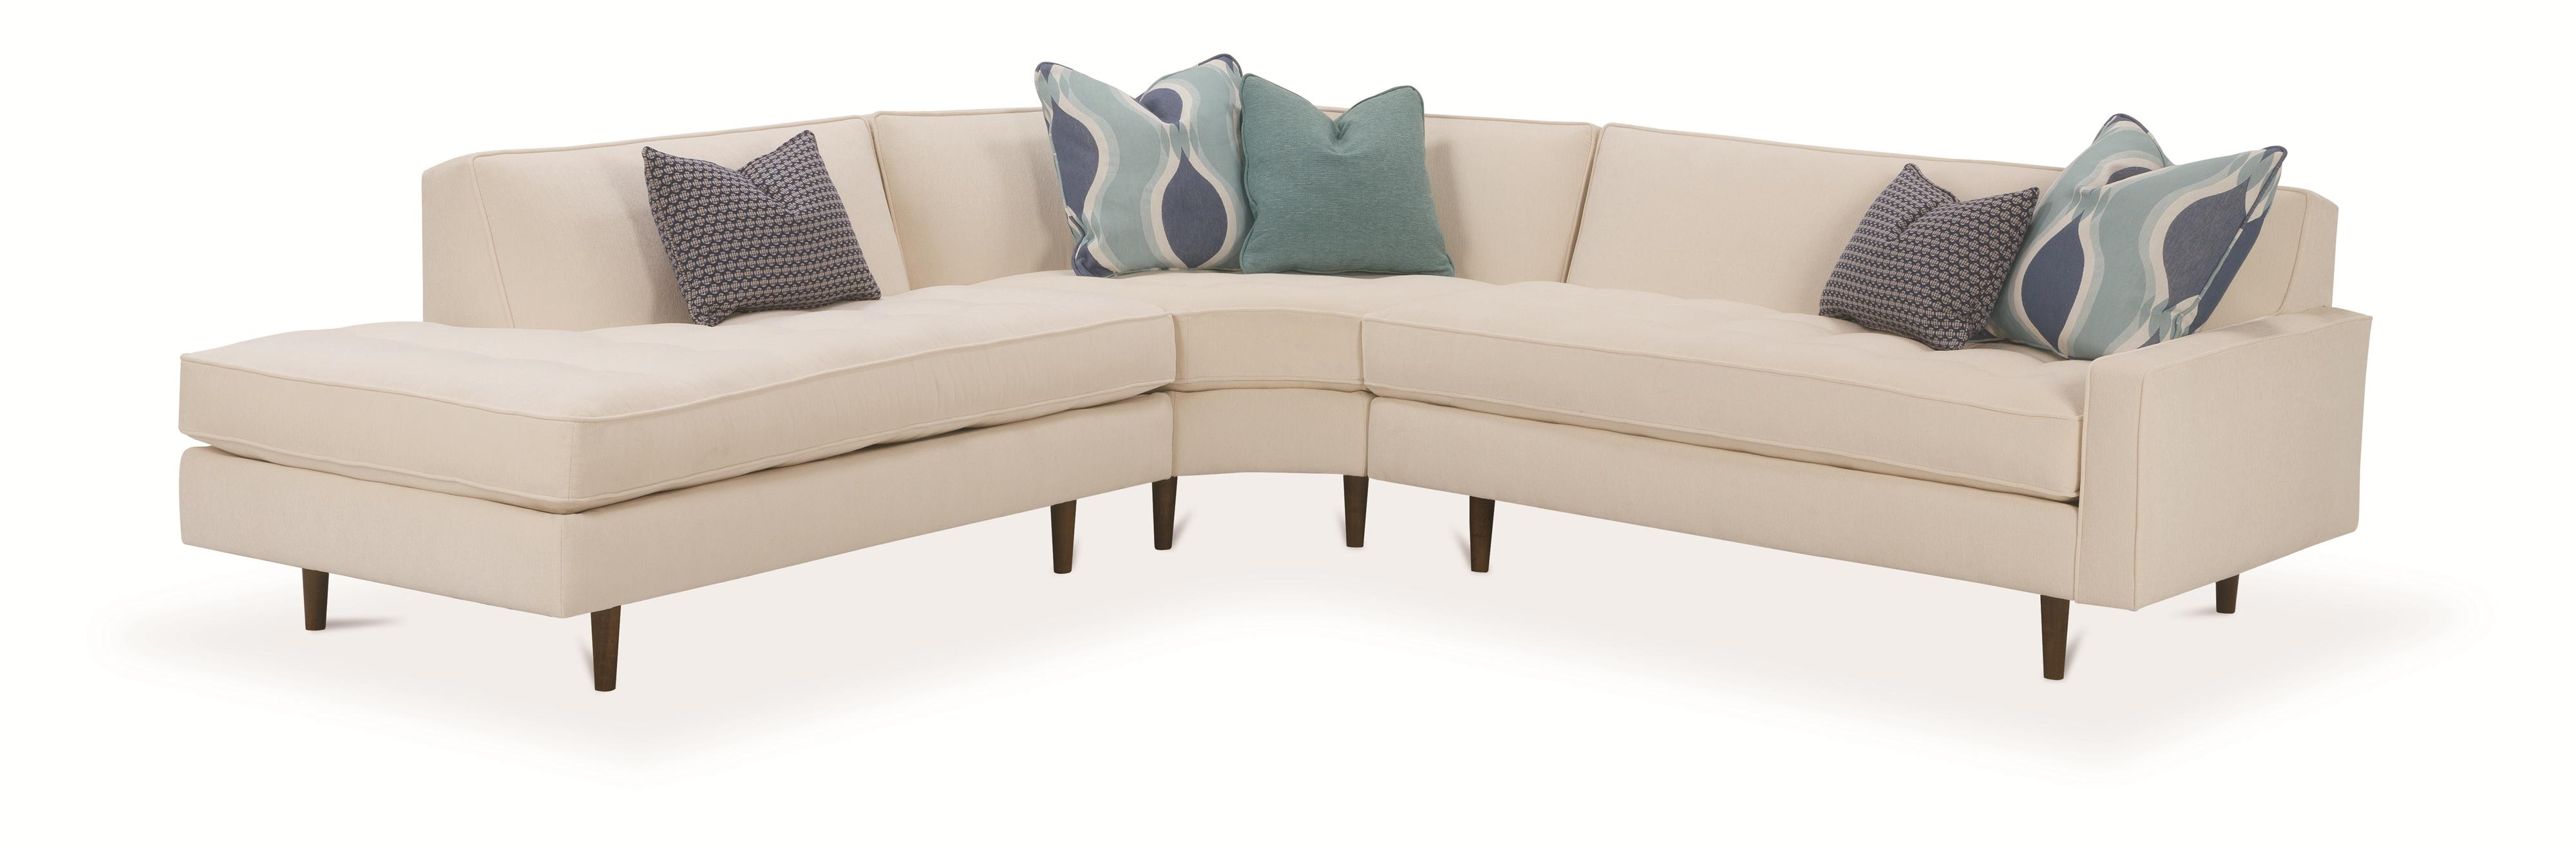 Rowe brady contemporary 3 piece sectional sofa with track for 3 piece sectional sofa